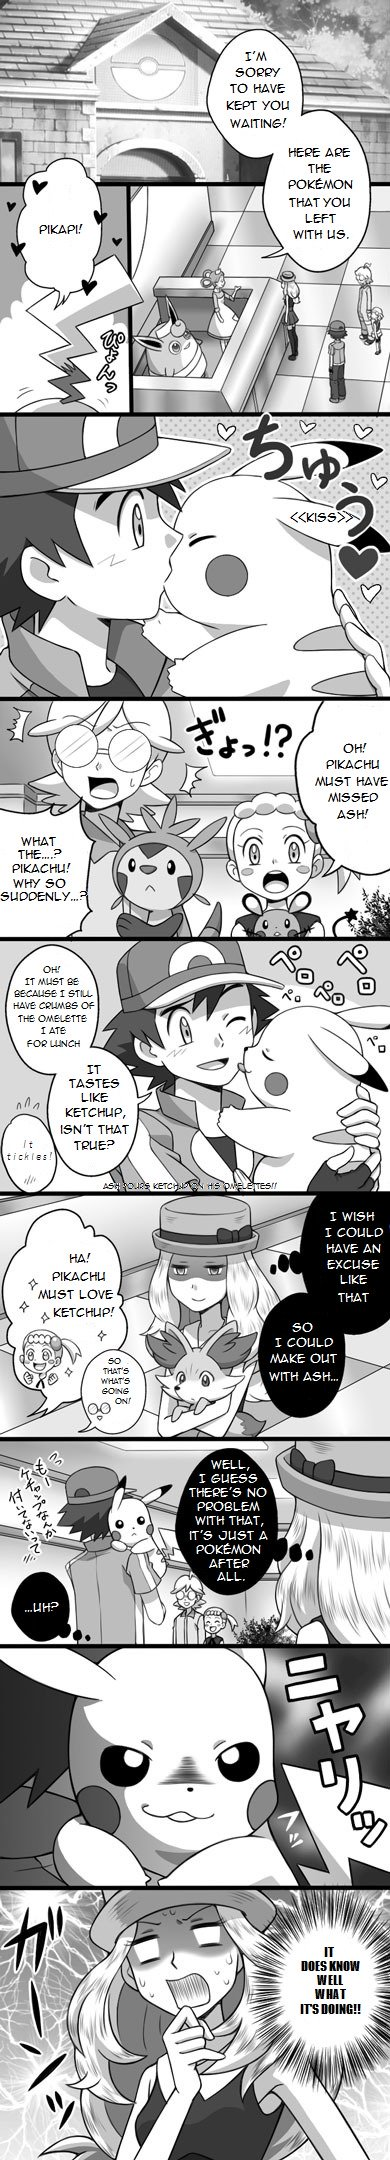 Funny Pokemon Black And White Comics 53 best funny pokemon comics images | pokemon, pokemon